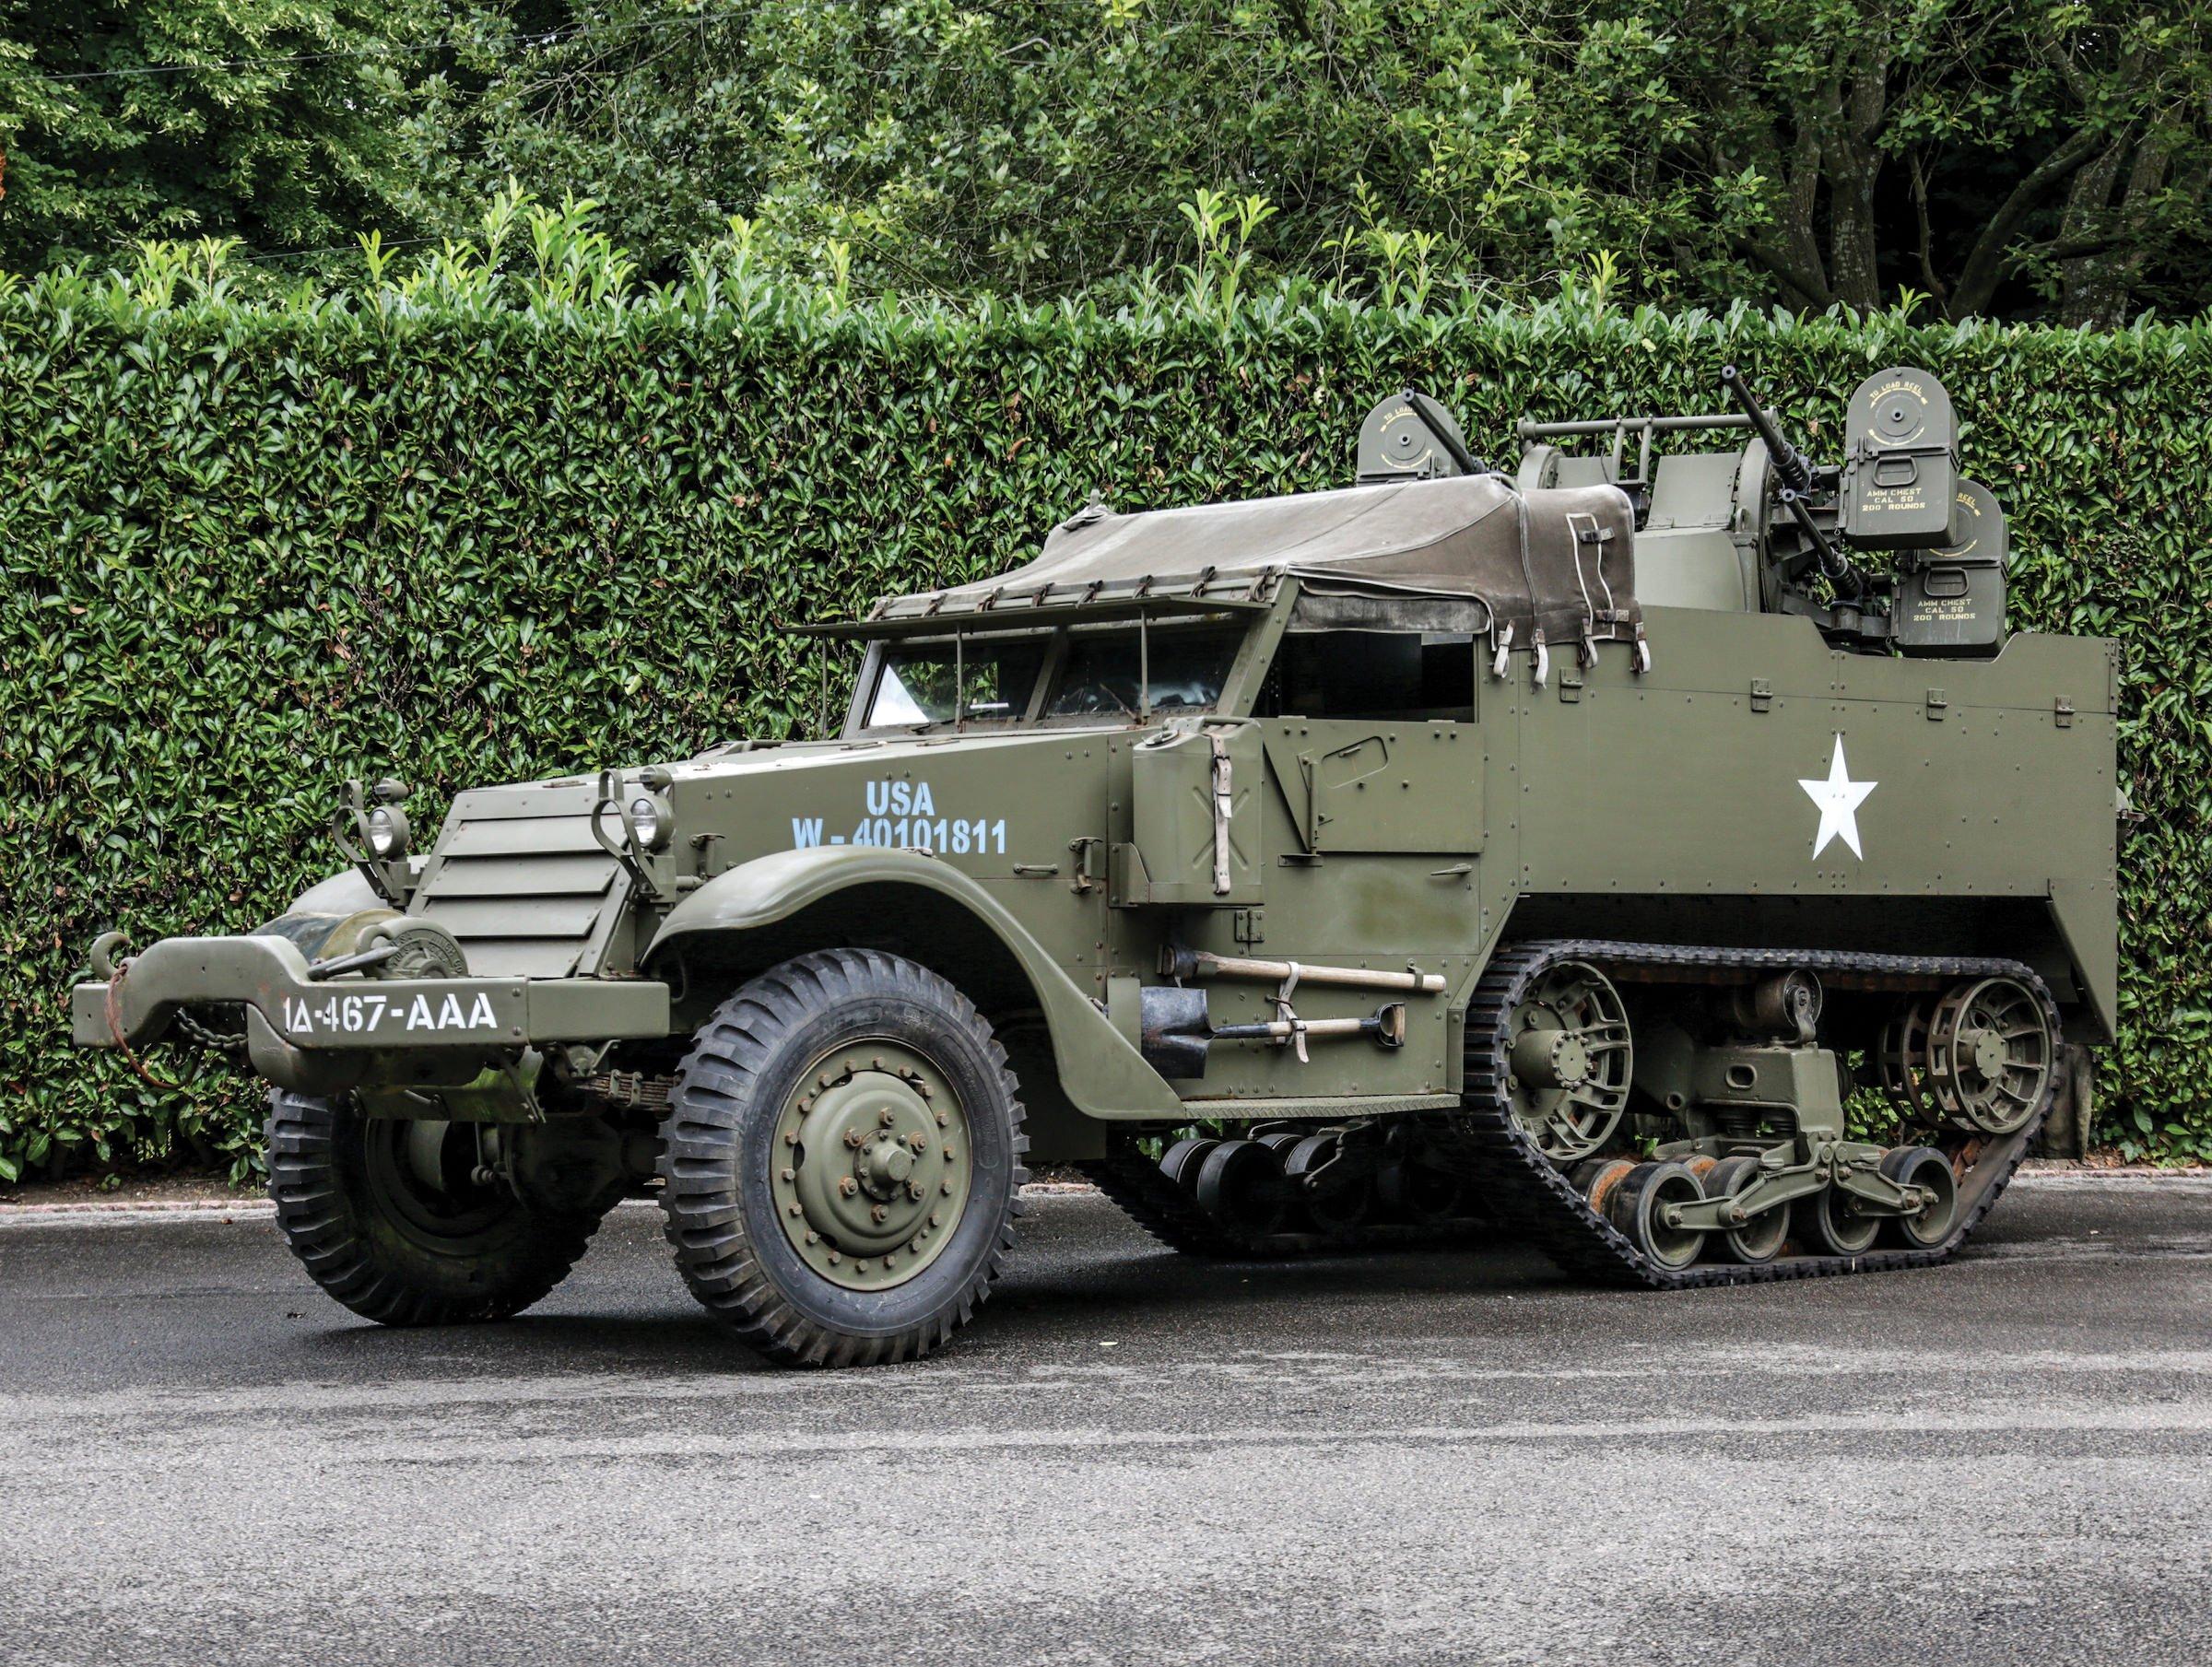 White M16 MGMC Half-Track